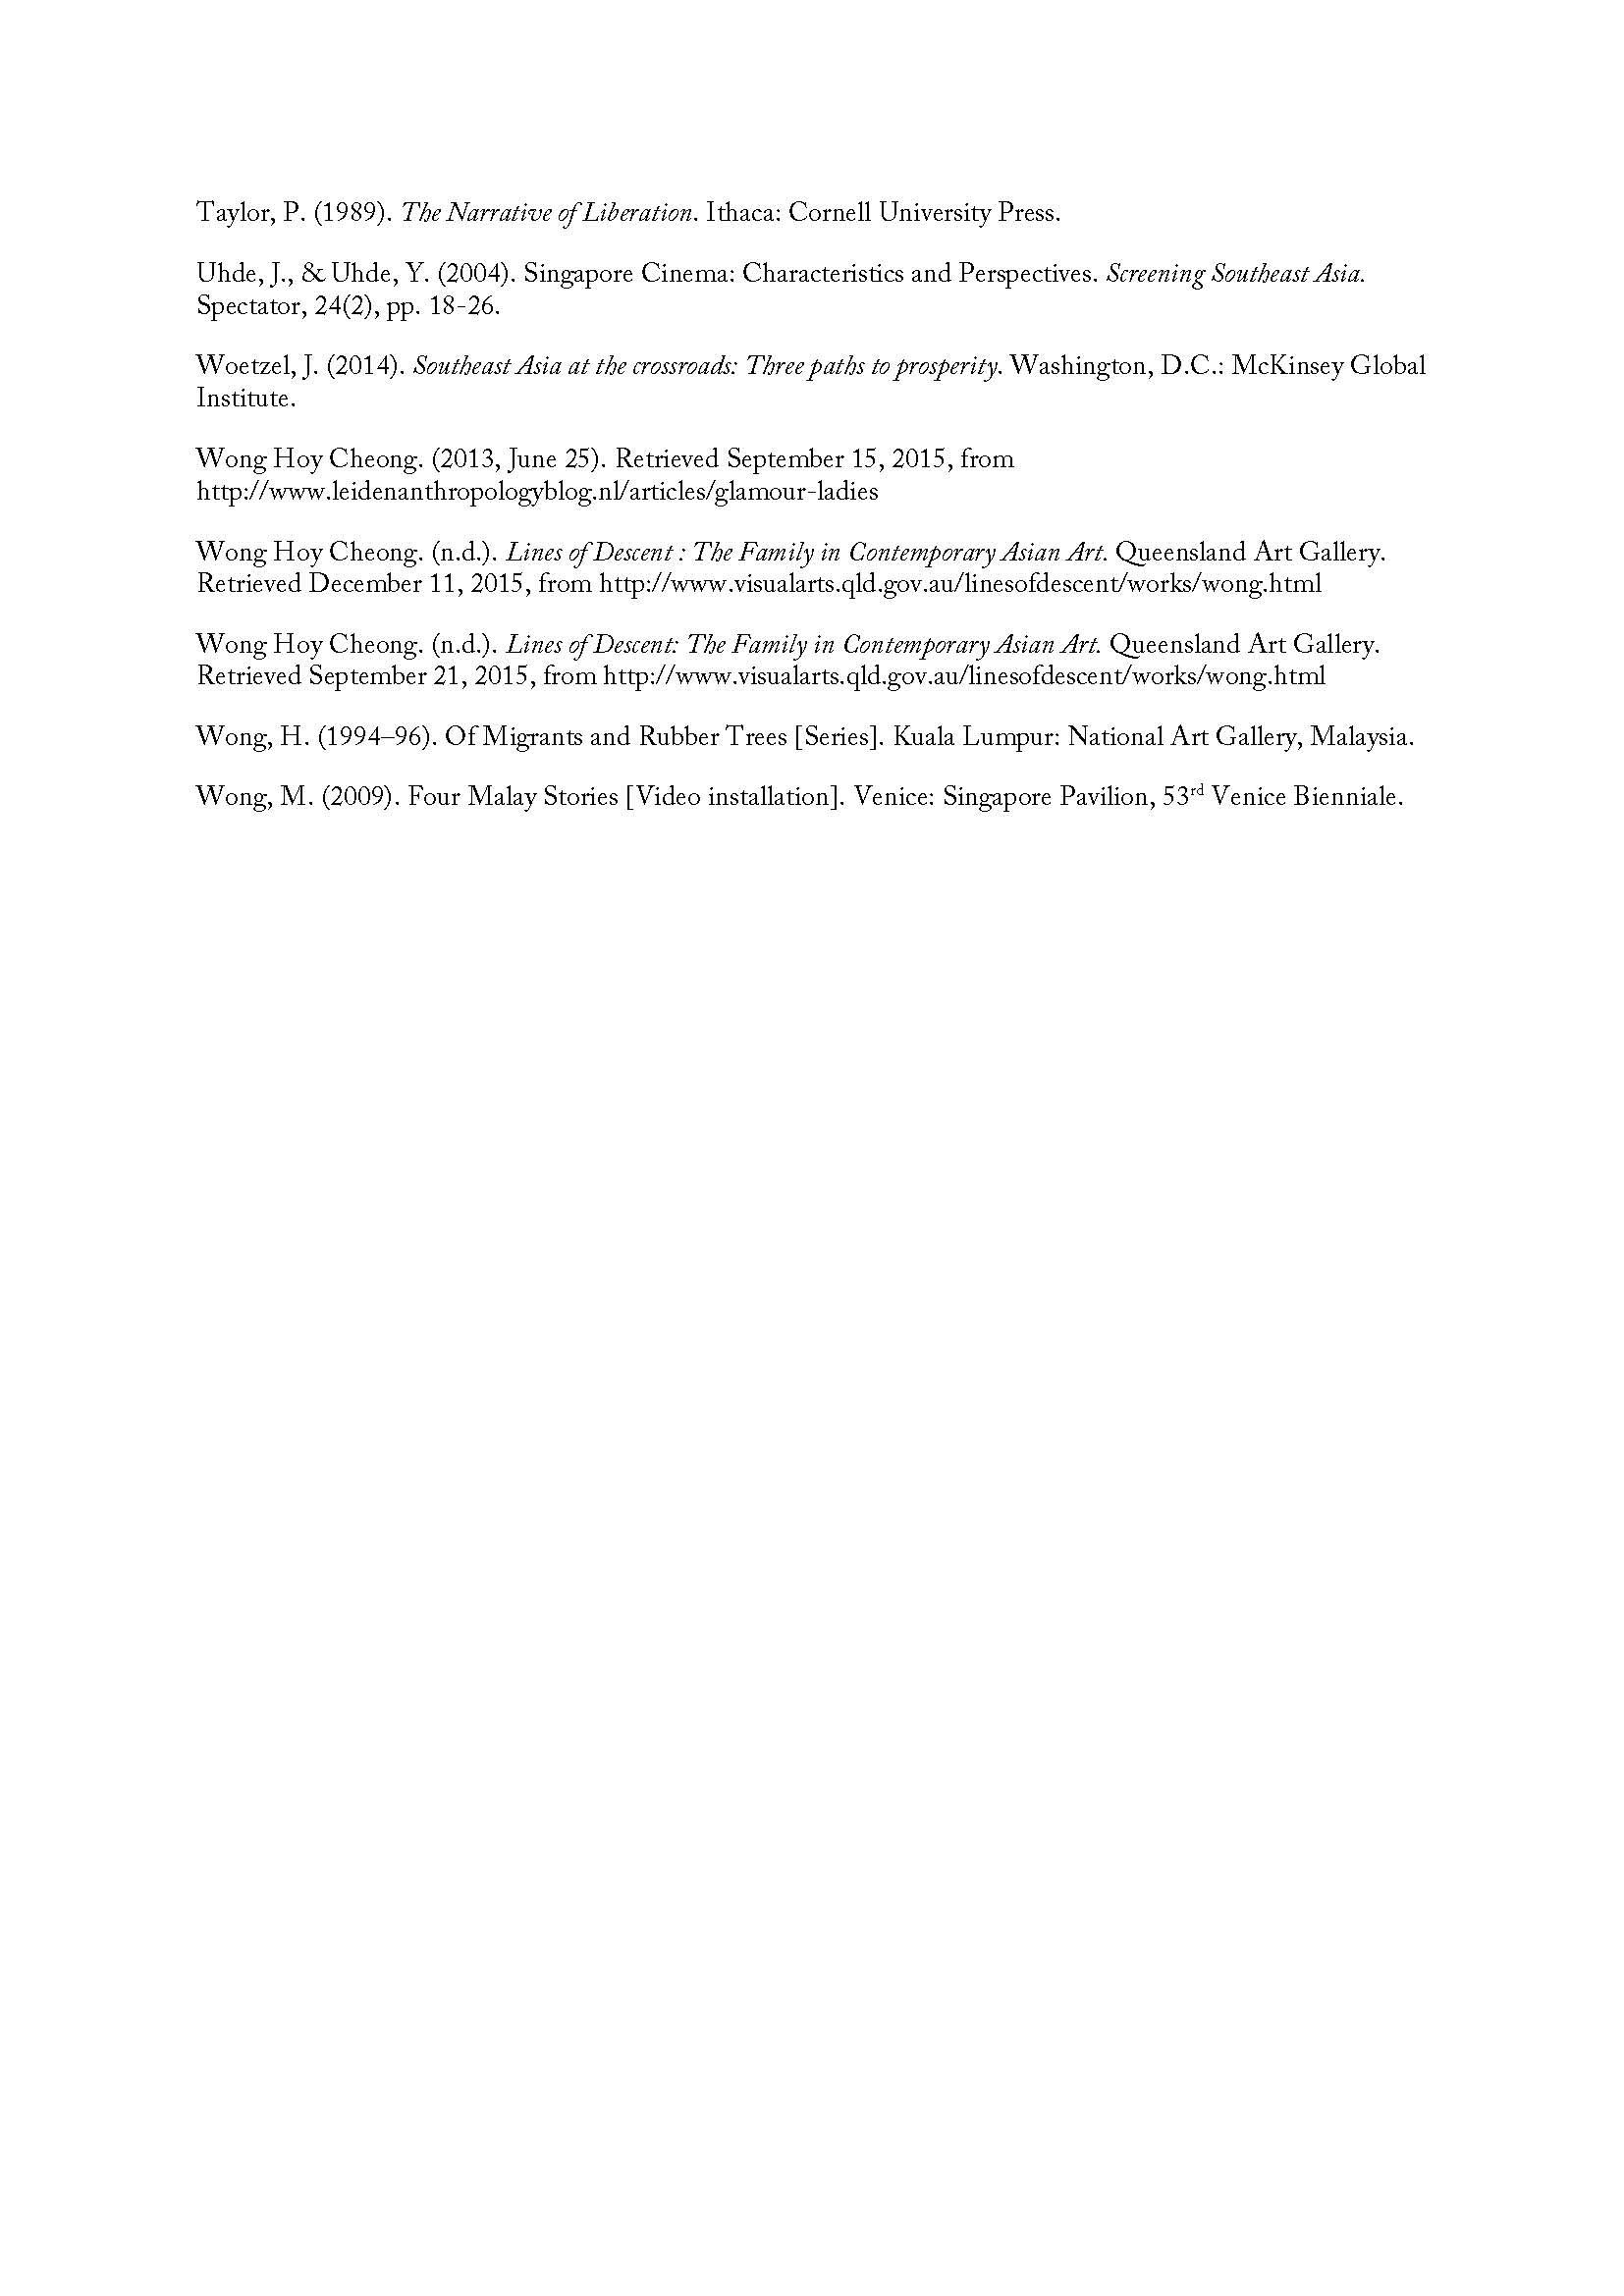 bibliographyfinal_Page_5-min_1654